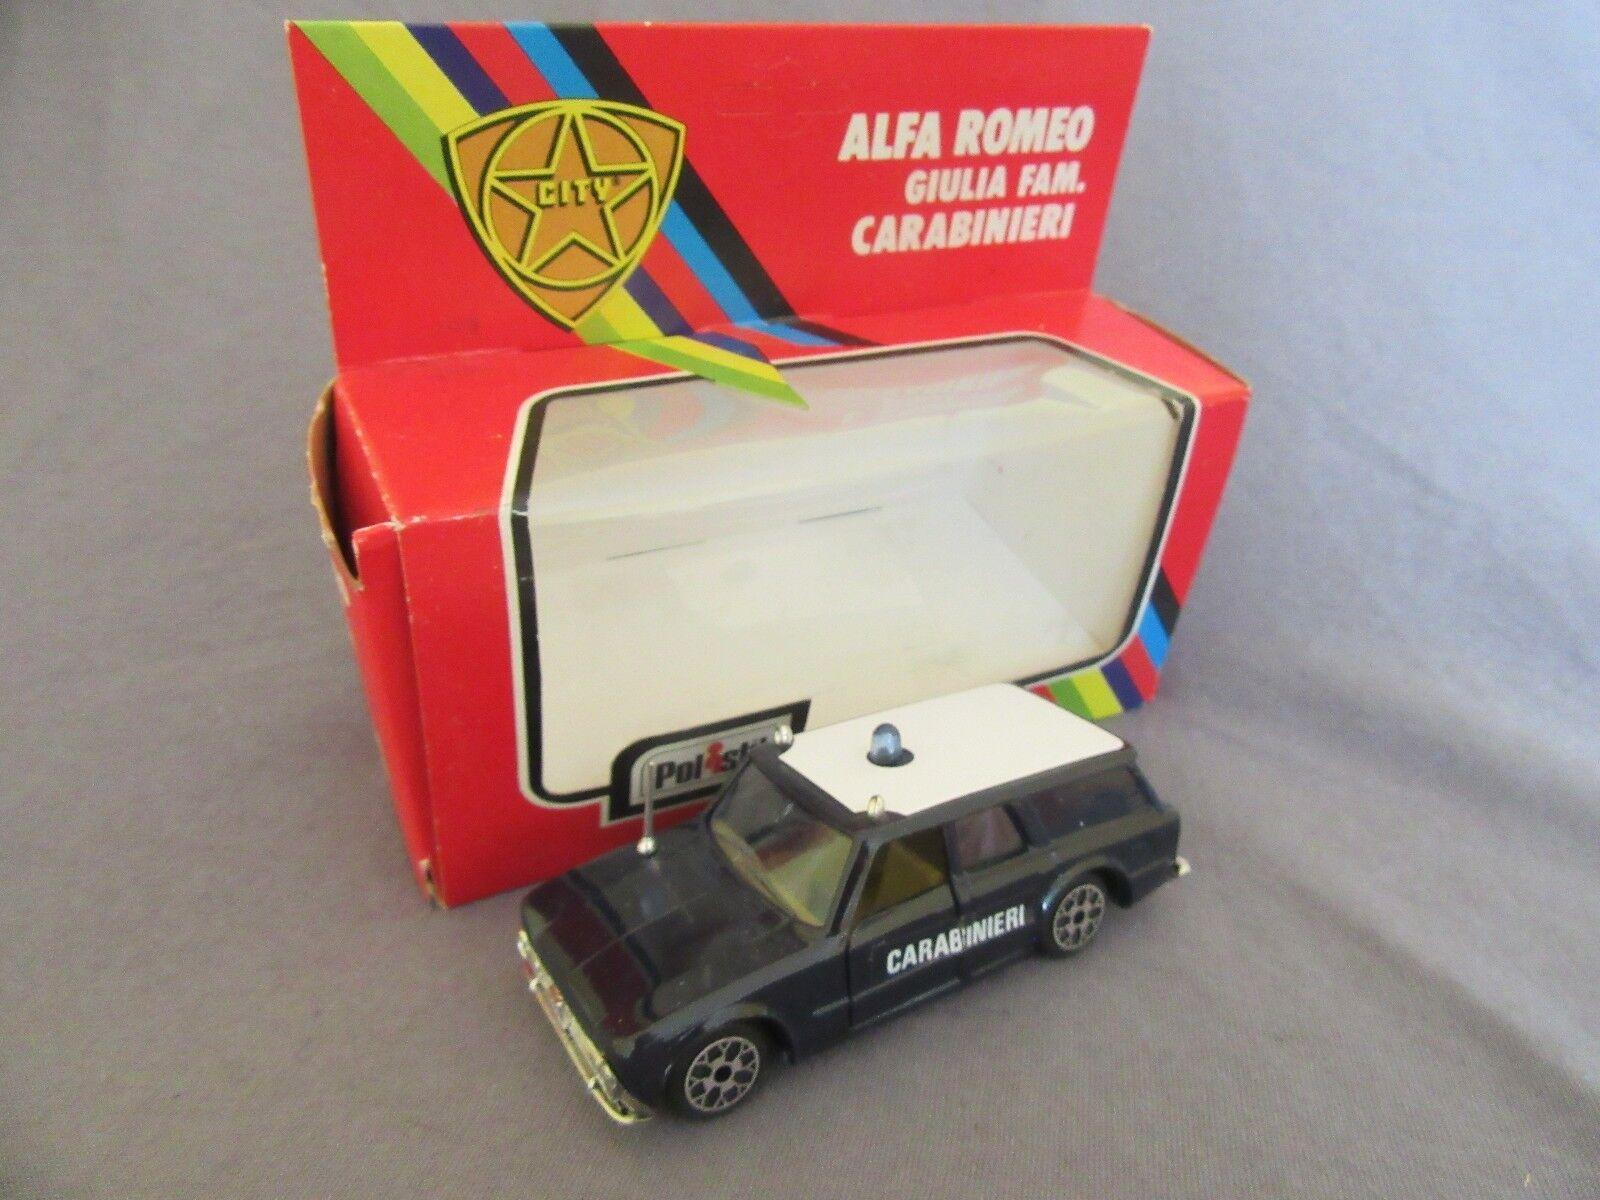 213G Polistil CE15 City Alfa Romeo Giulia Carabinegros De La Fam 1 43